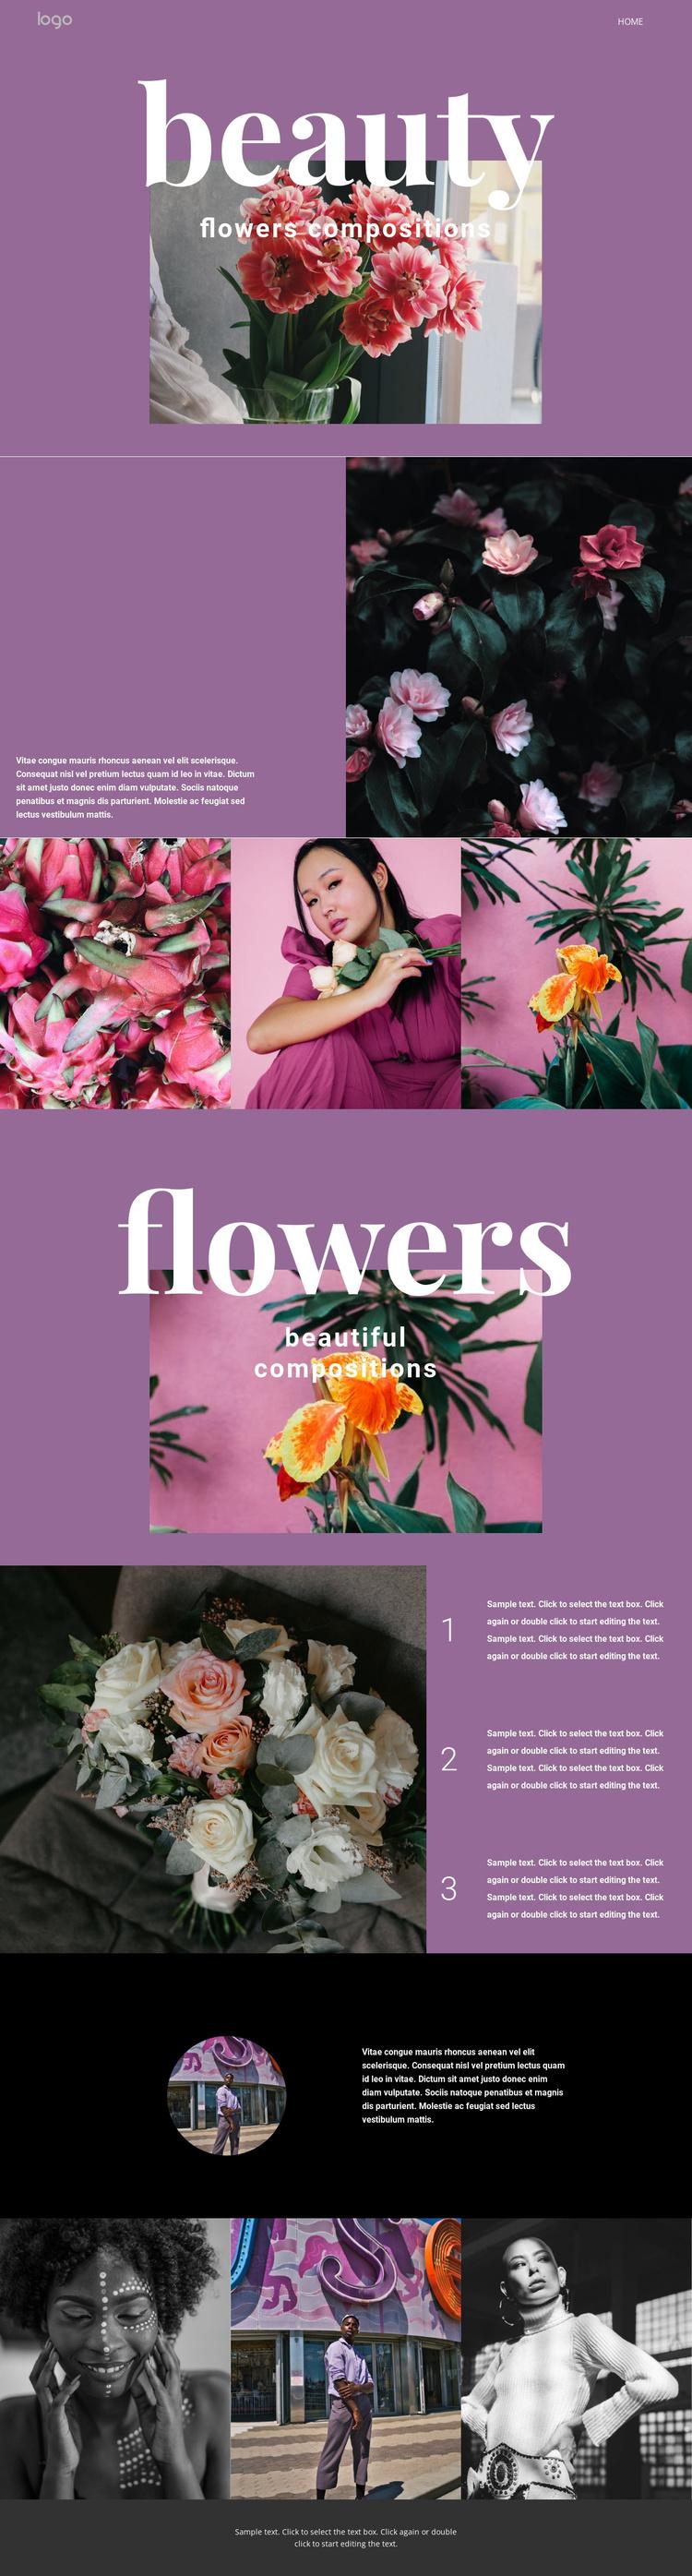 Flower salon Joomla Template